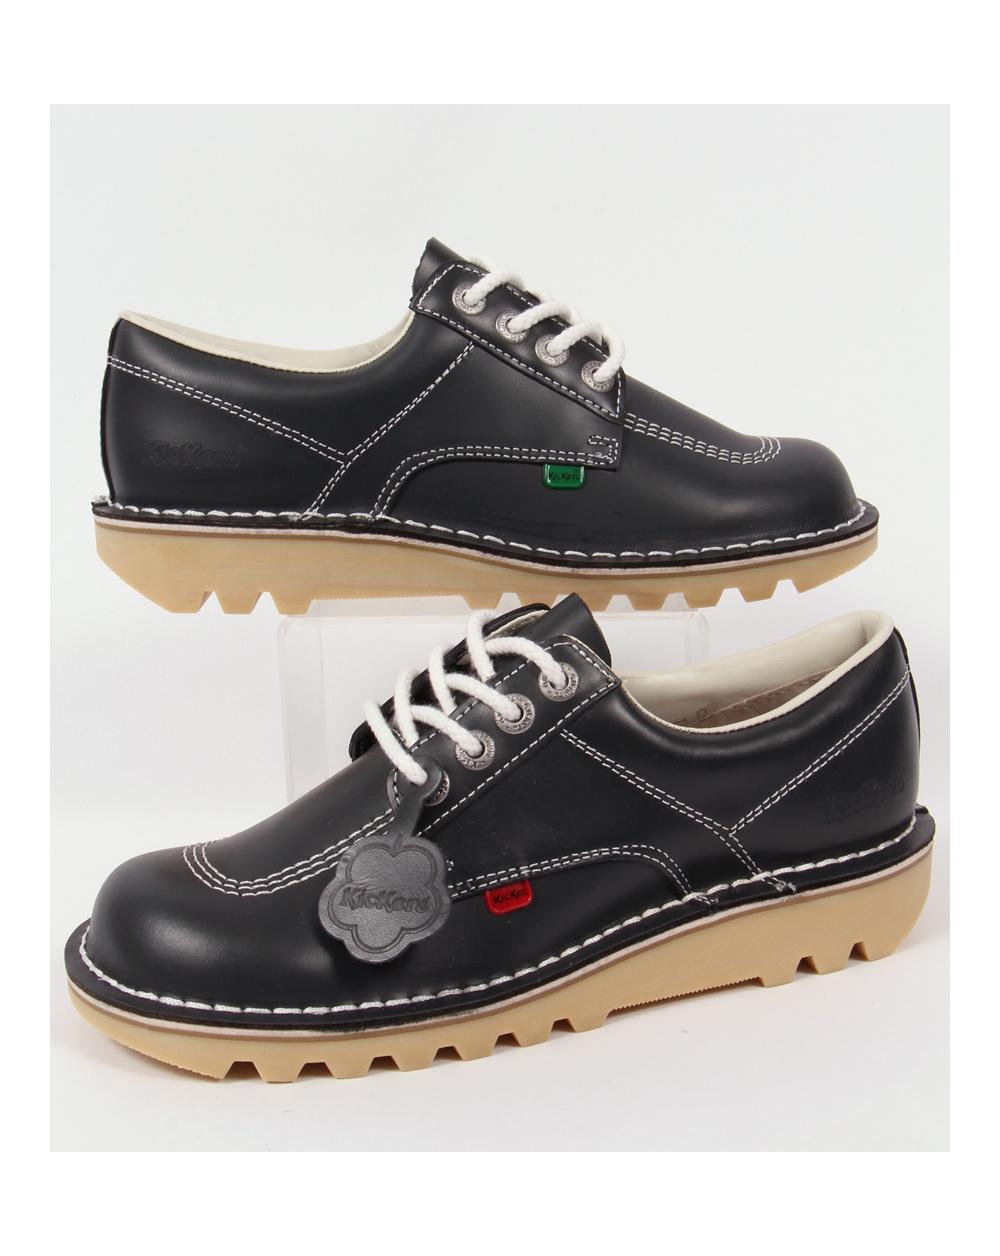 ec02fd5ada Kickers Kick Lo Shoes Navy Blue - kickers kick lo leather, navy blue